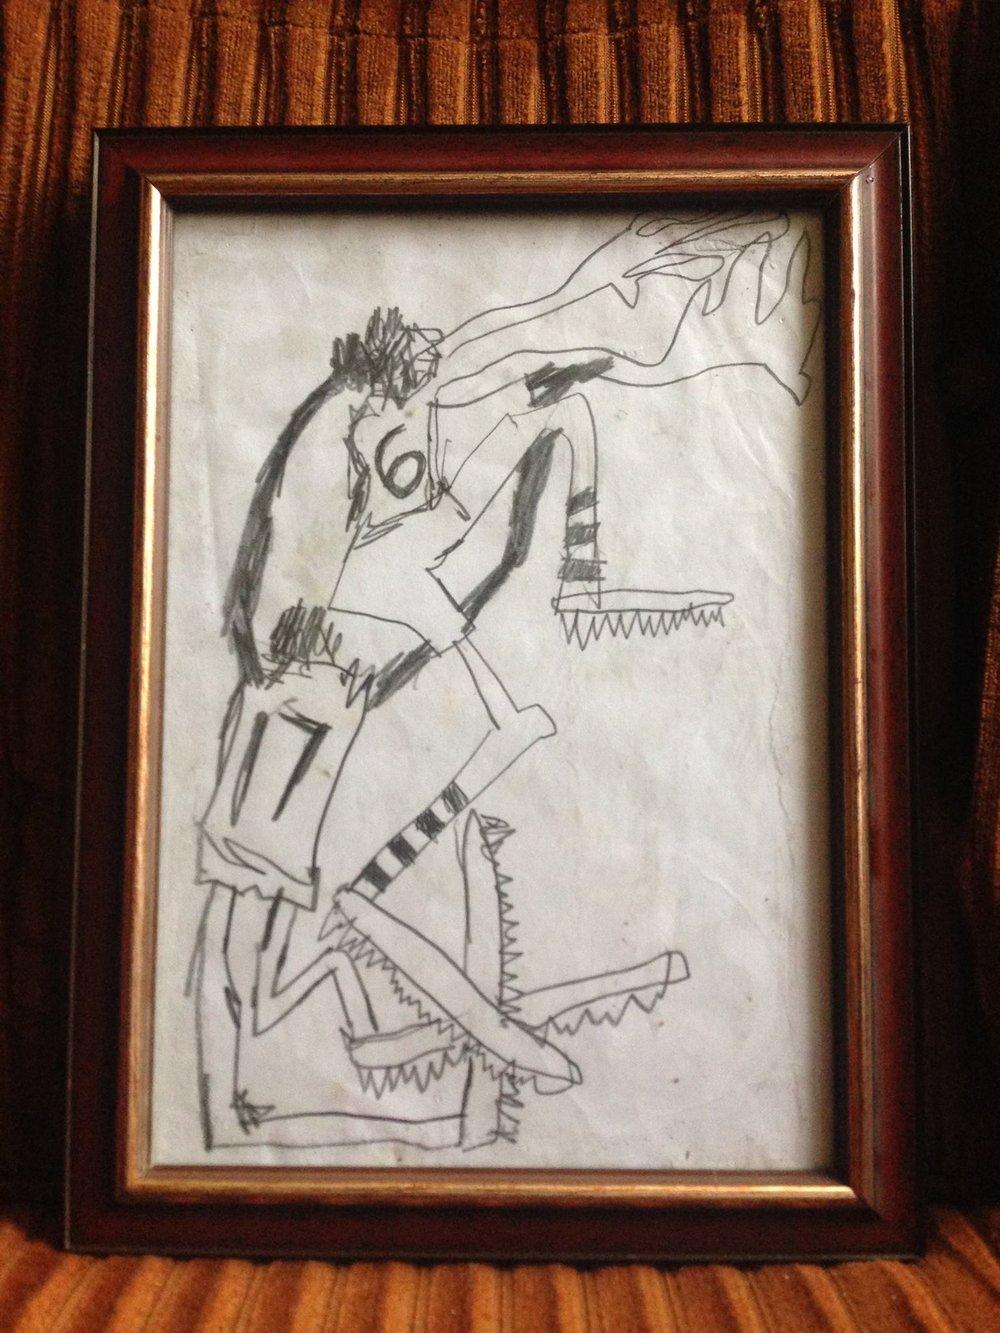 Contested Mark  by Emlyn Johnson